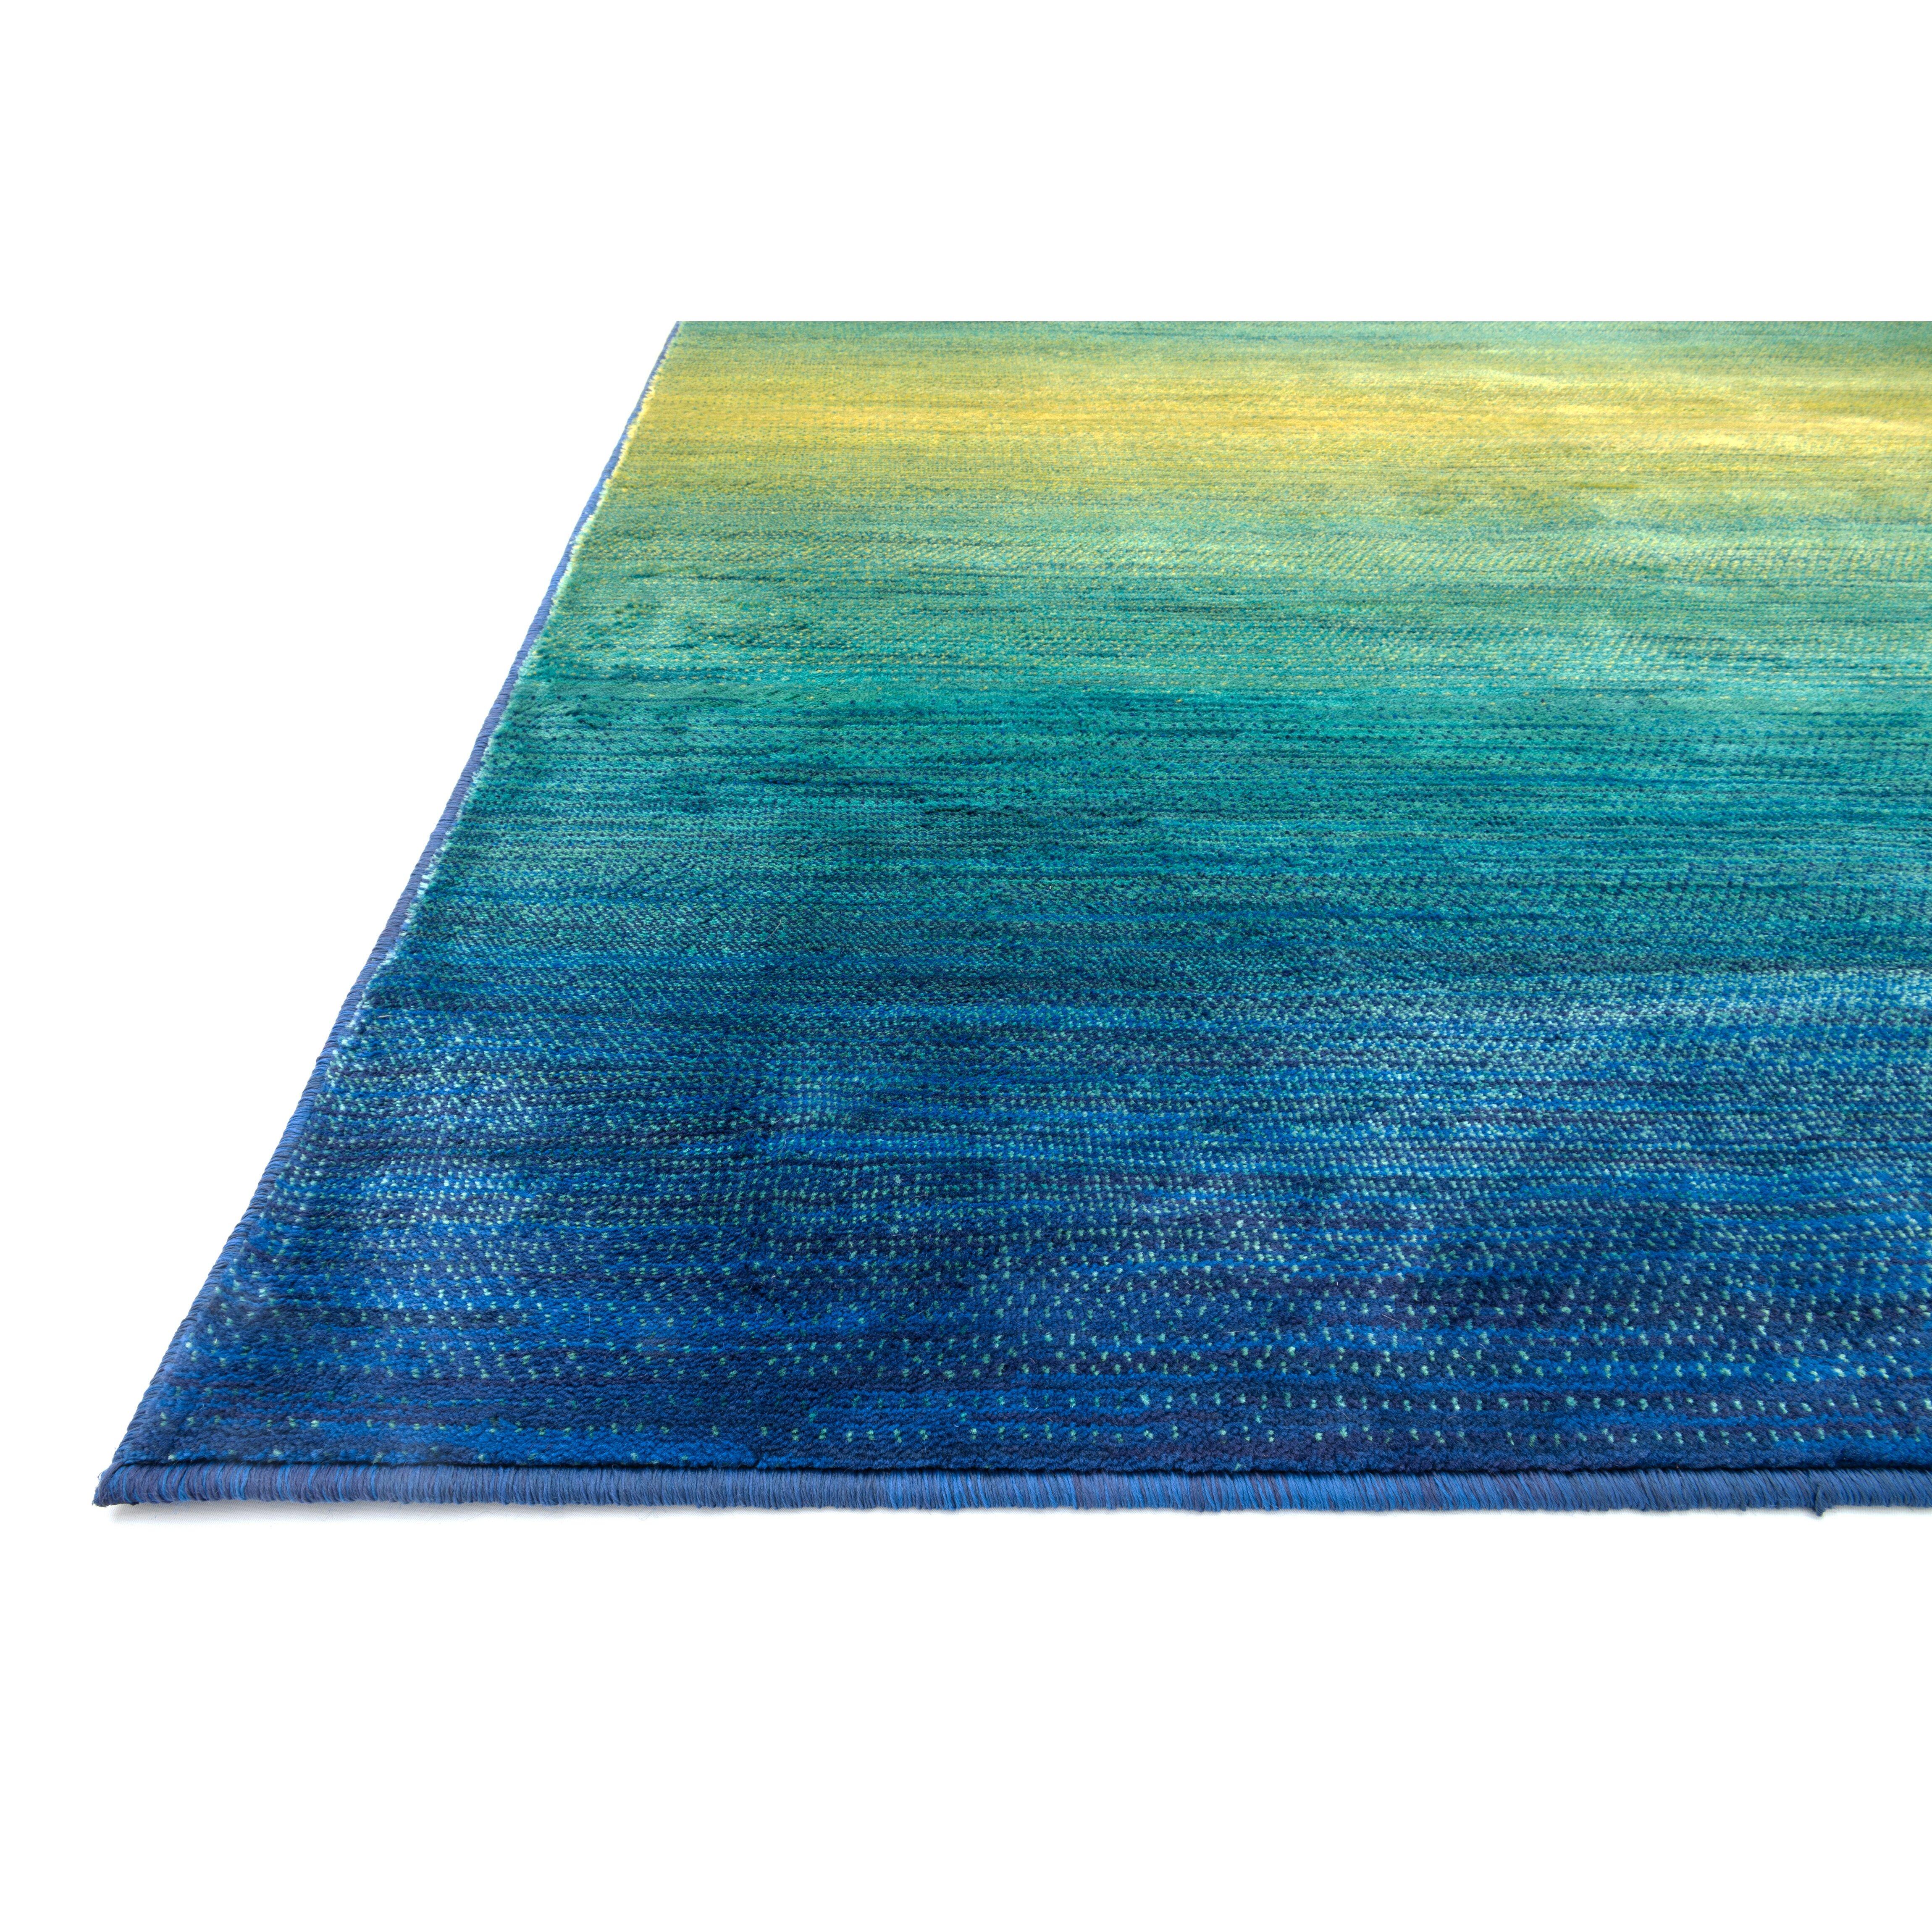 The Conestoga Trading Co. Blue/Green Area Rug & Reviews